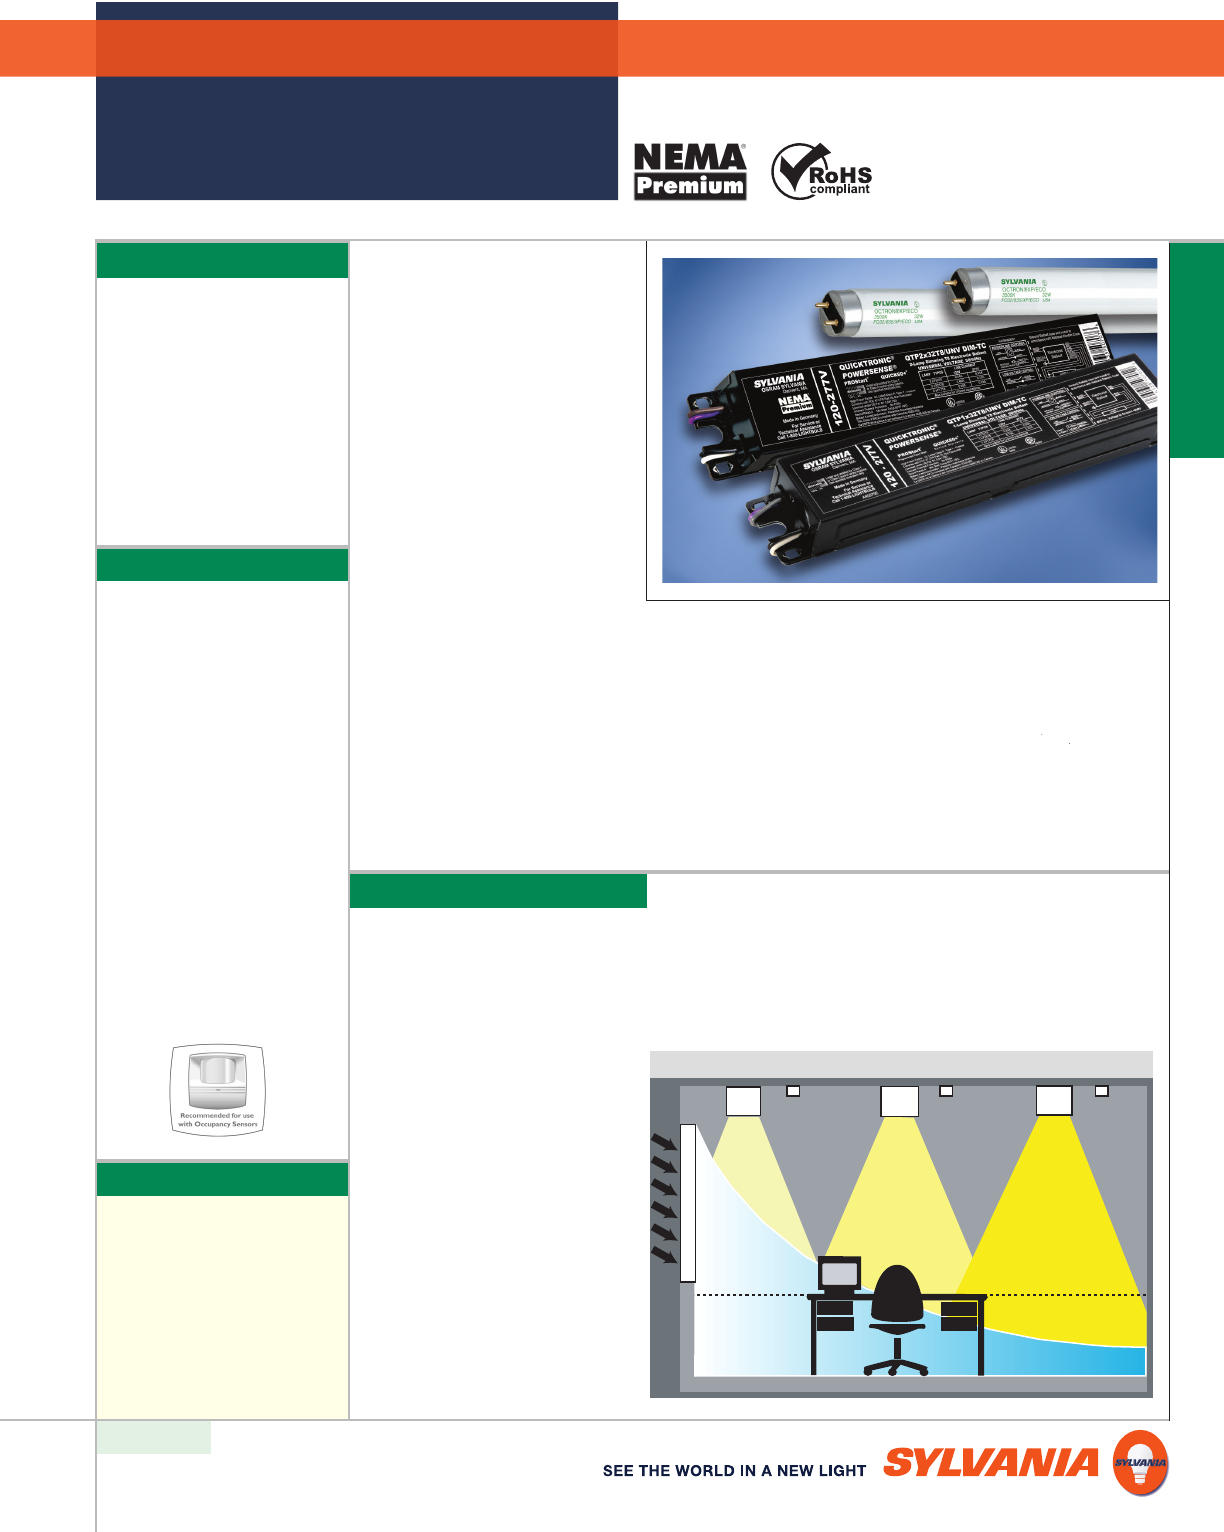 GE T8 To The Manual 843660bd 5b89 4299 919c ed98aa99742a  Lamp Ballast Wiring Diagram Qtp X T Unv Isn Sc on